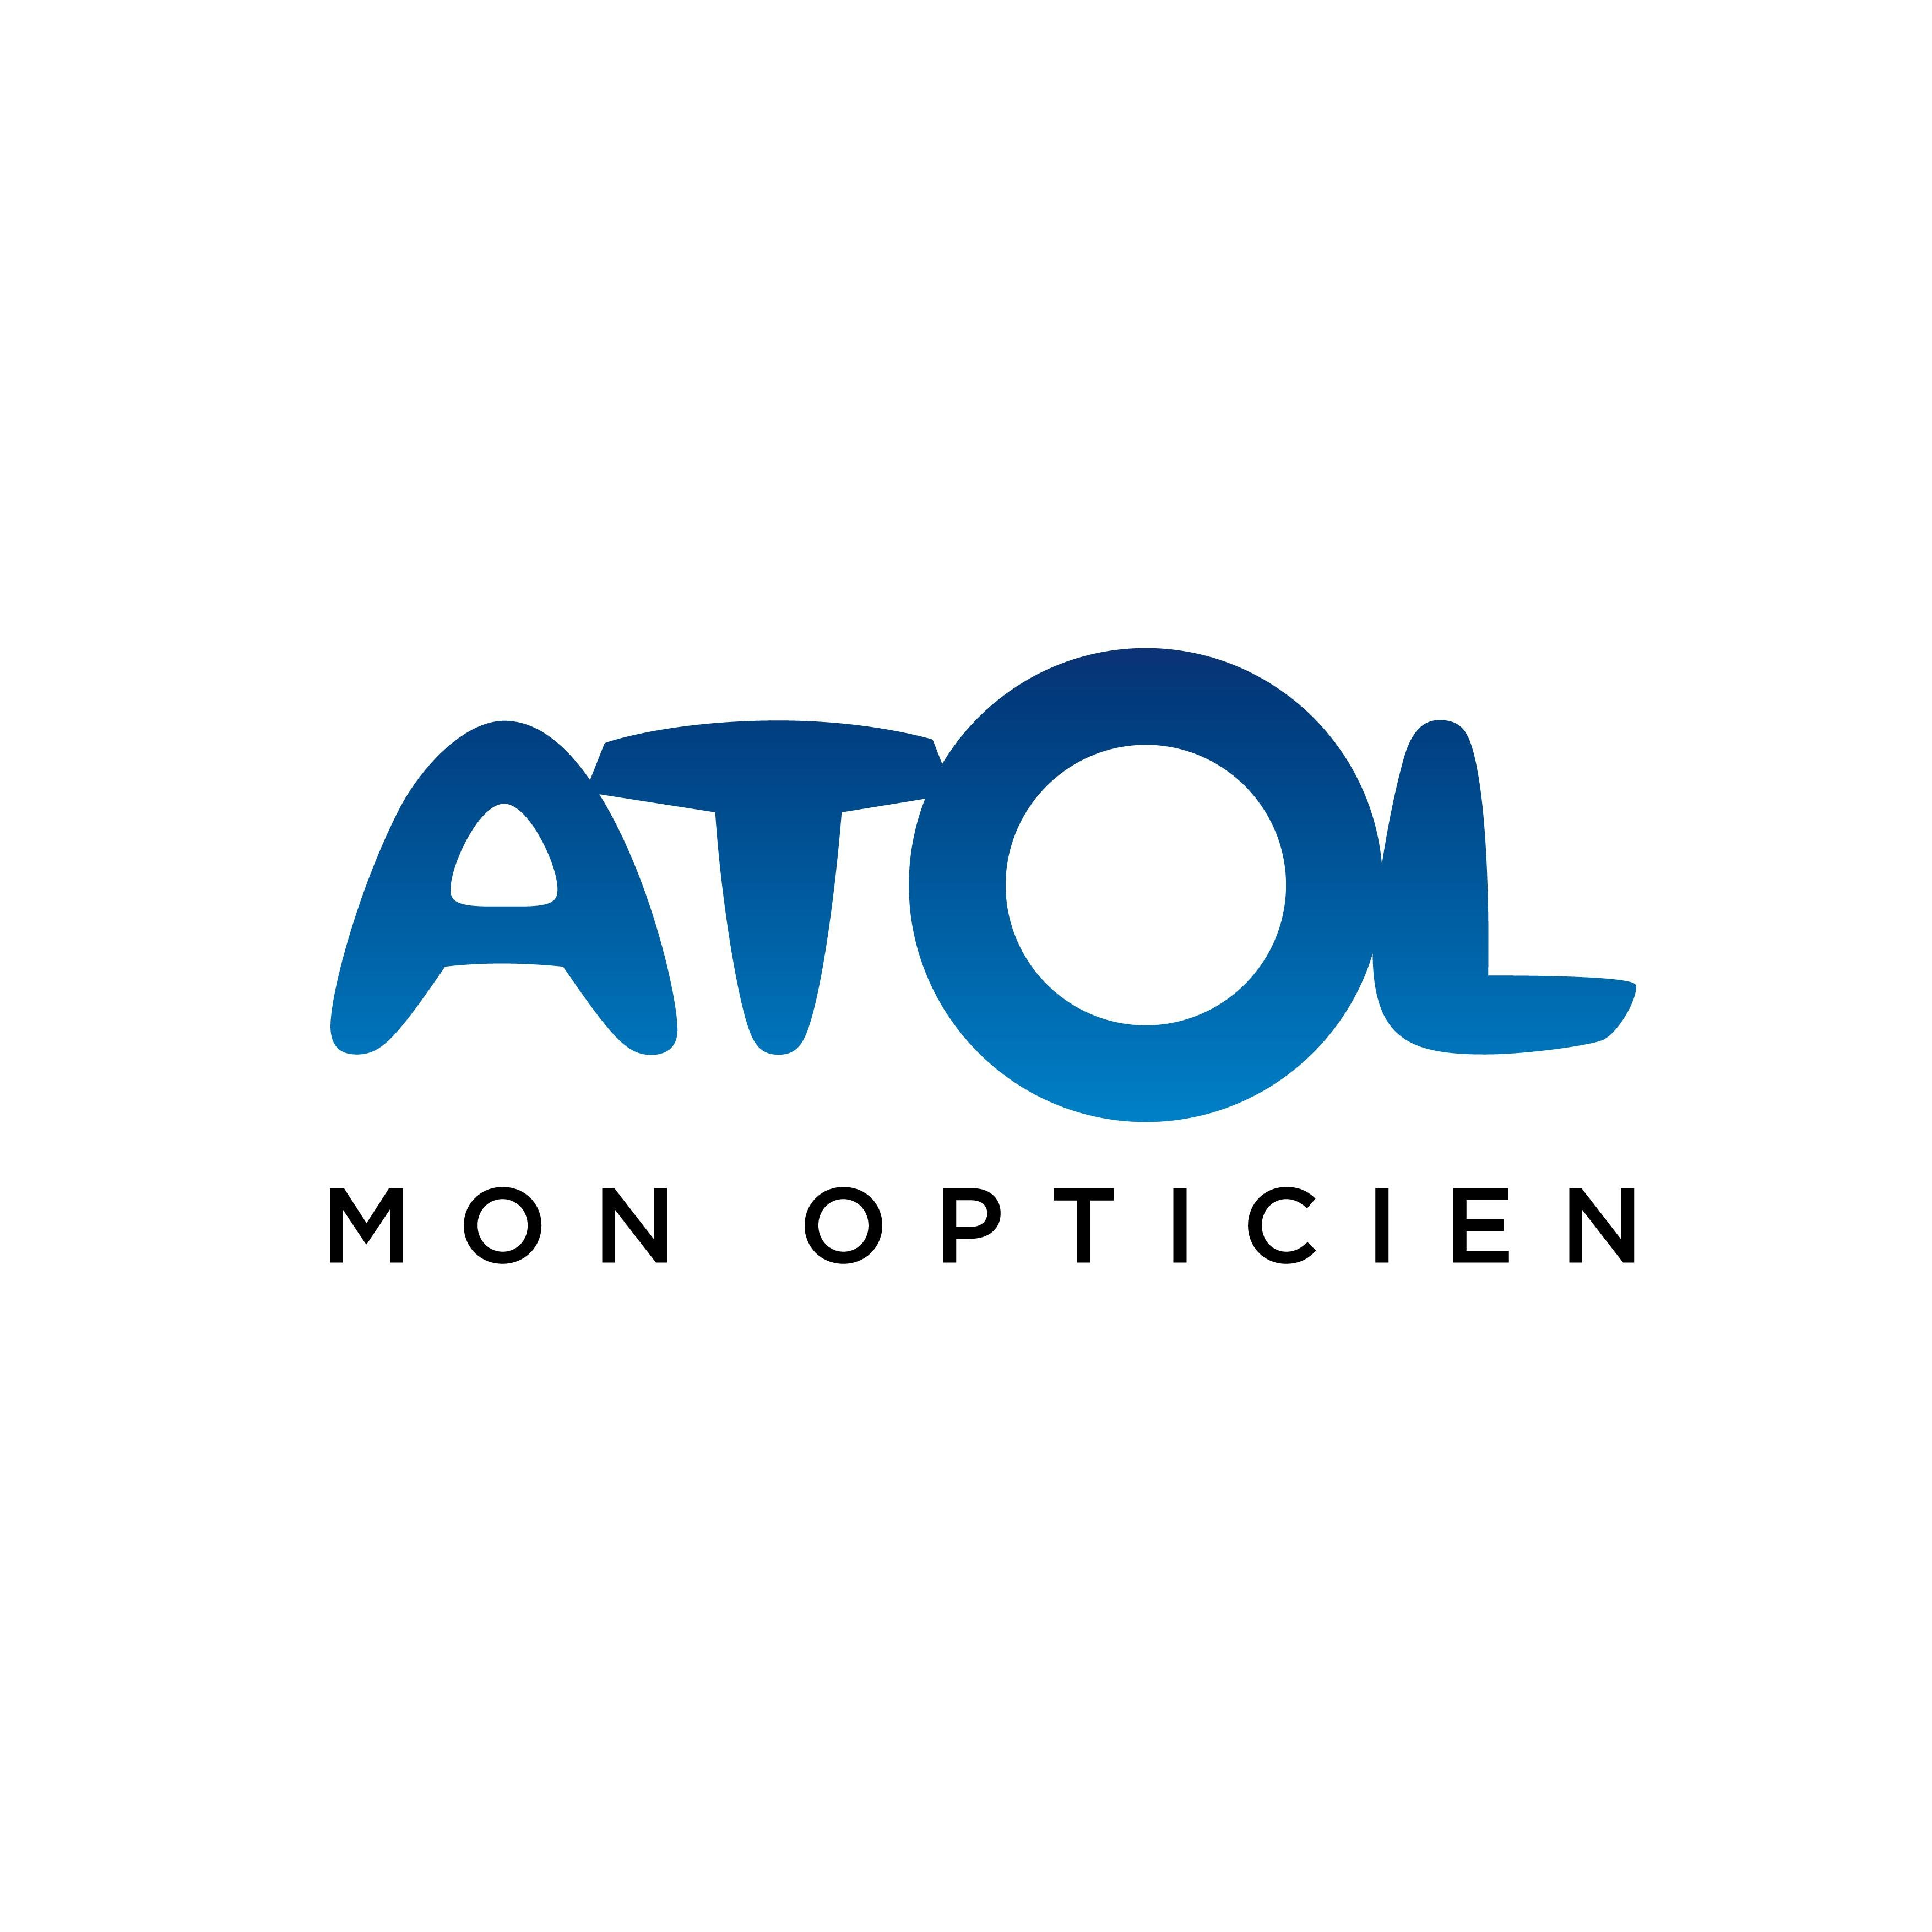 Atol Mon Opticien Beaurepaire